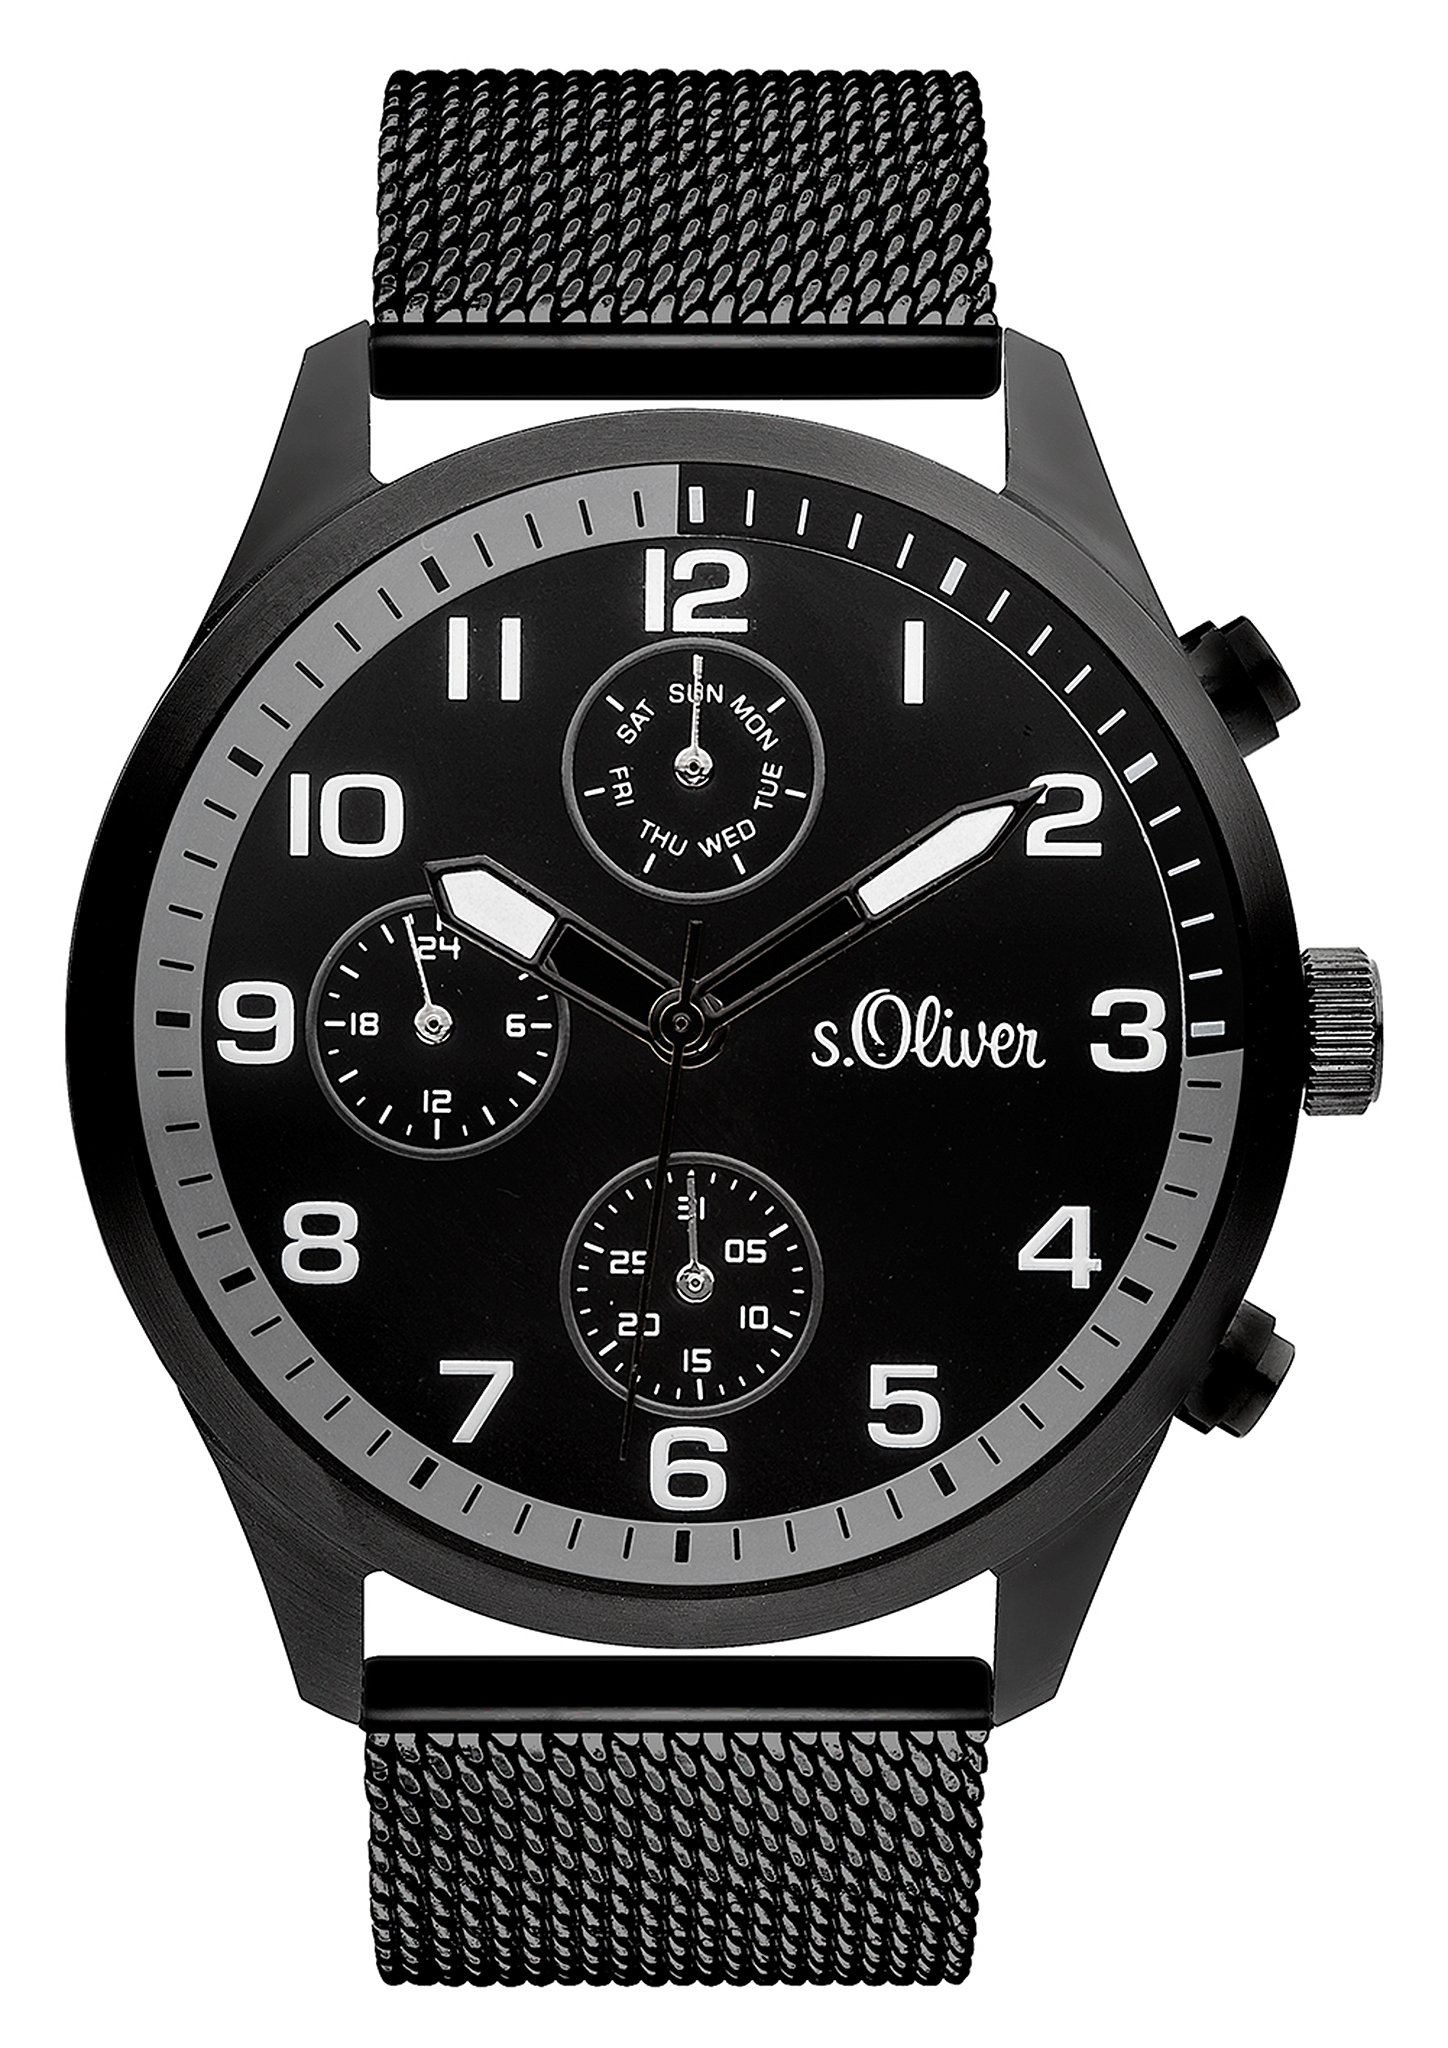 Armbanduhr | Uhren > Sonstige Armbanduhren | Grau/schwarz | Edelstahl| mineralglas | s.Oliver